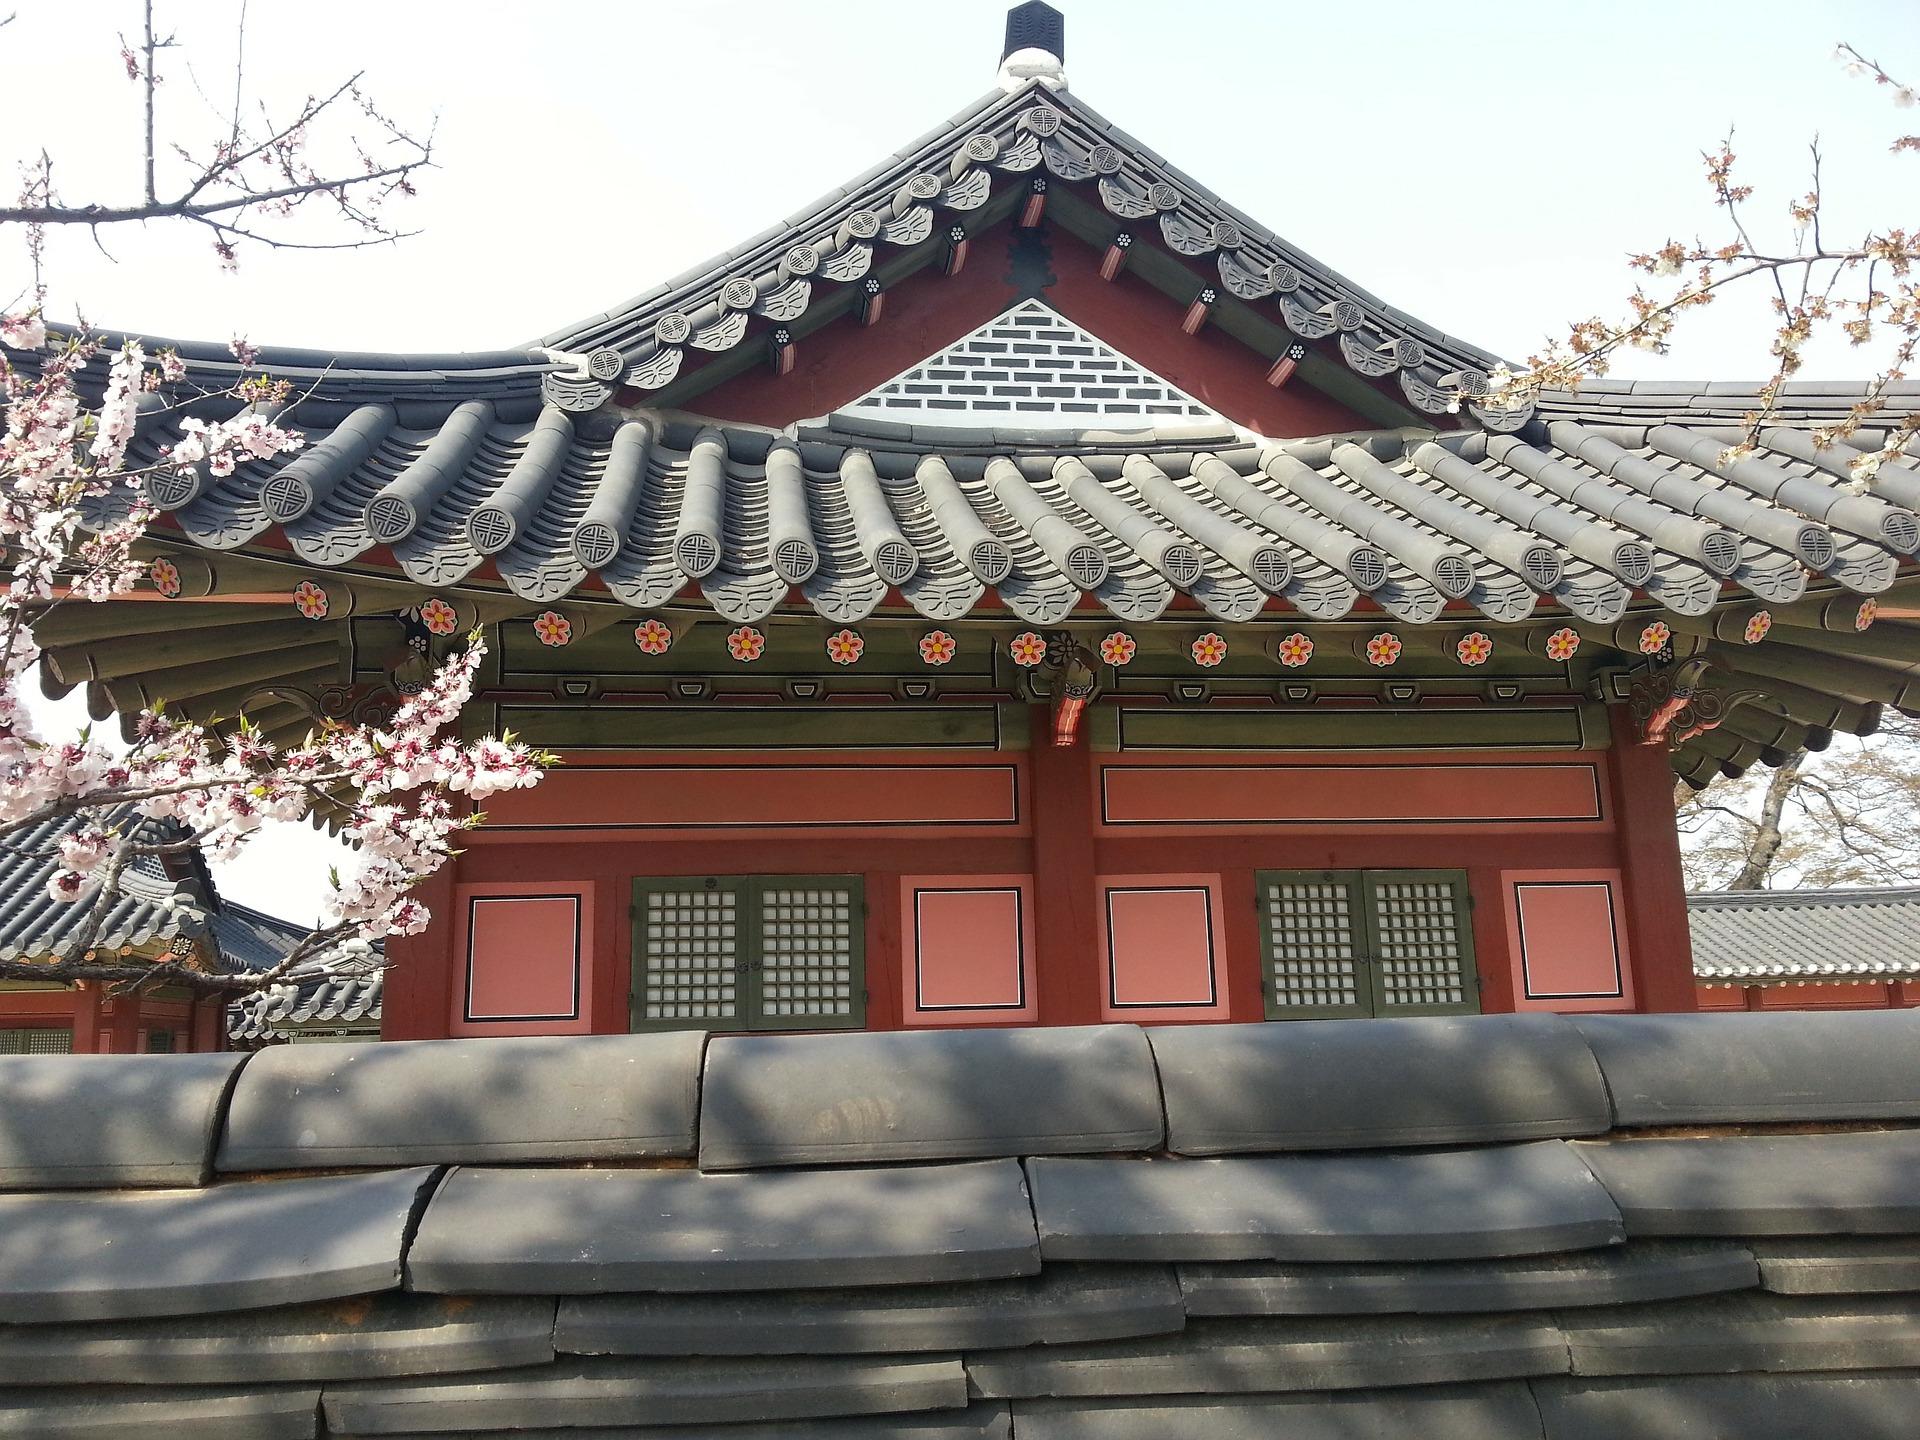 republic-of-korea-140418_1920.jpg